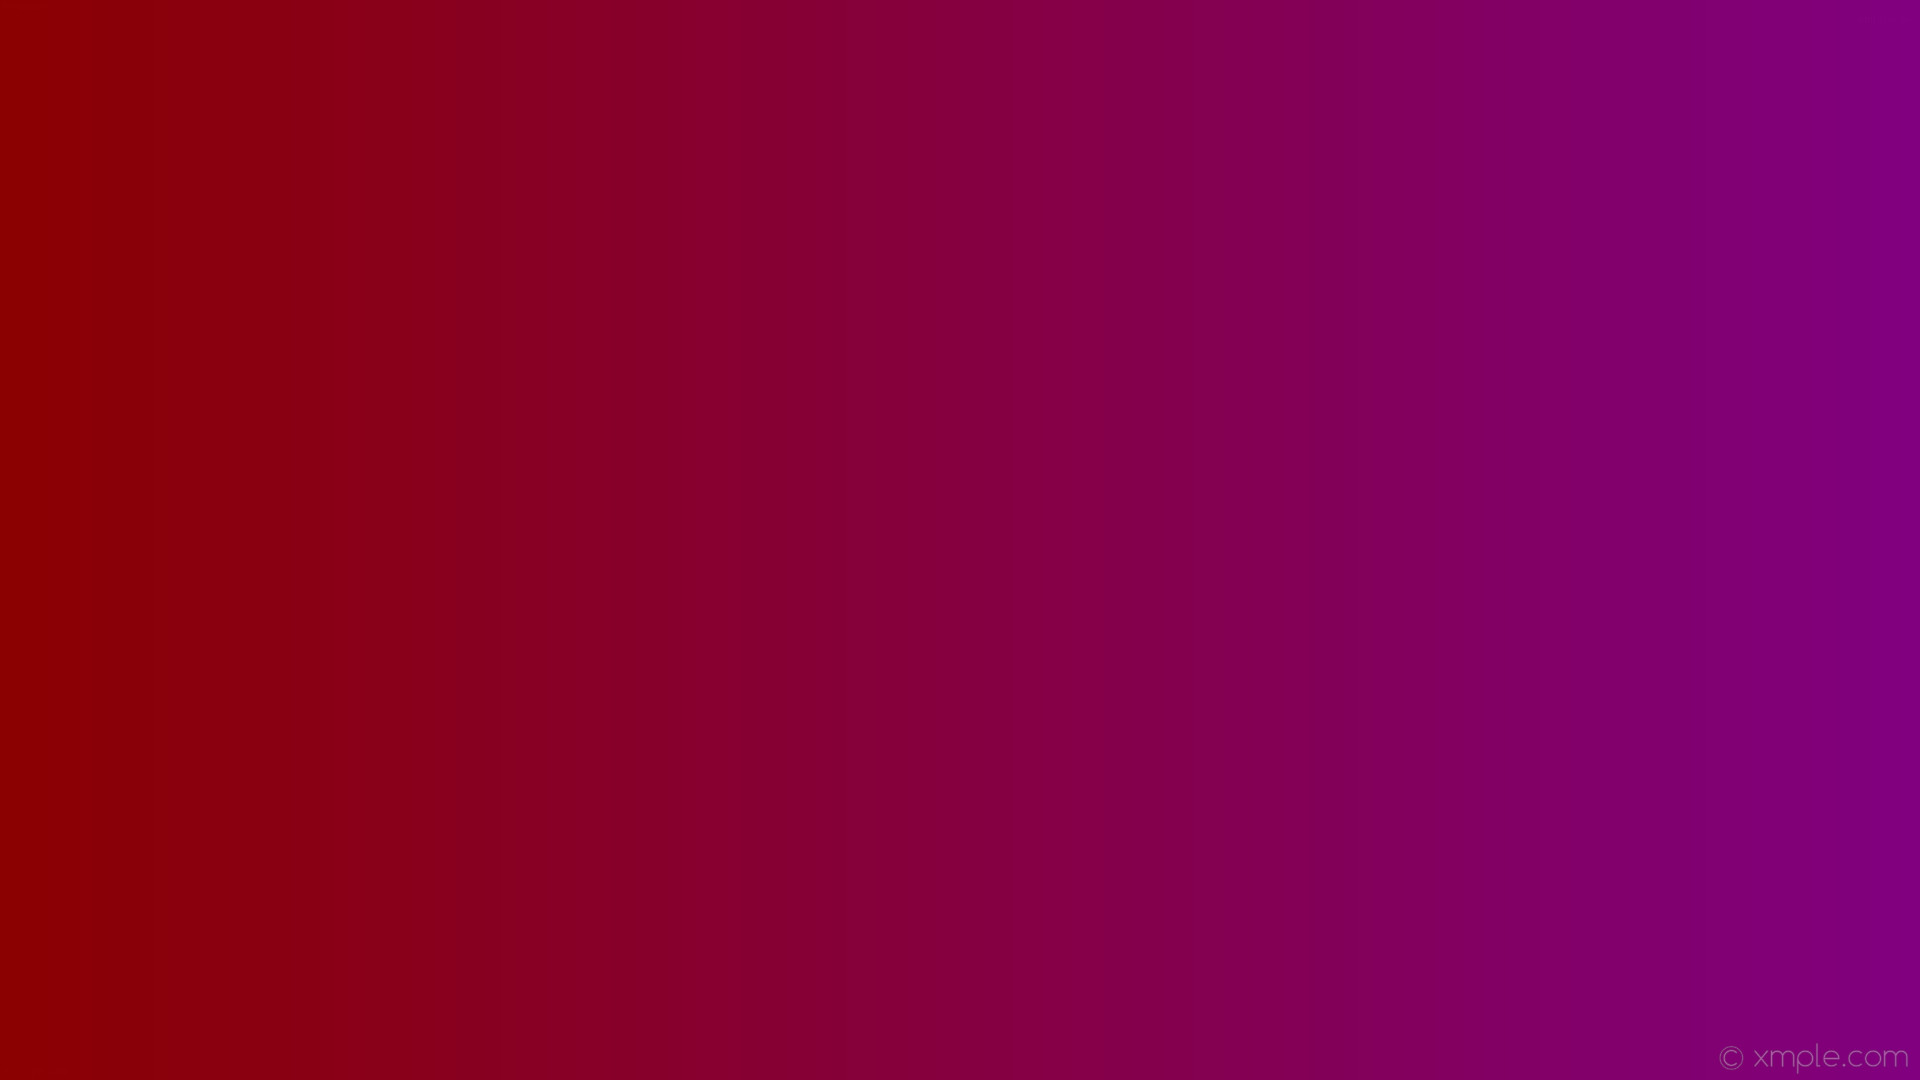 wallpaper purple red gradient linear dark red #800080 #8b0000 0°